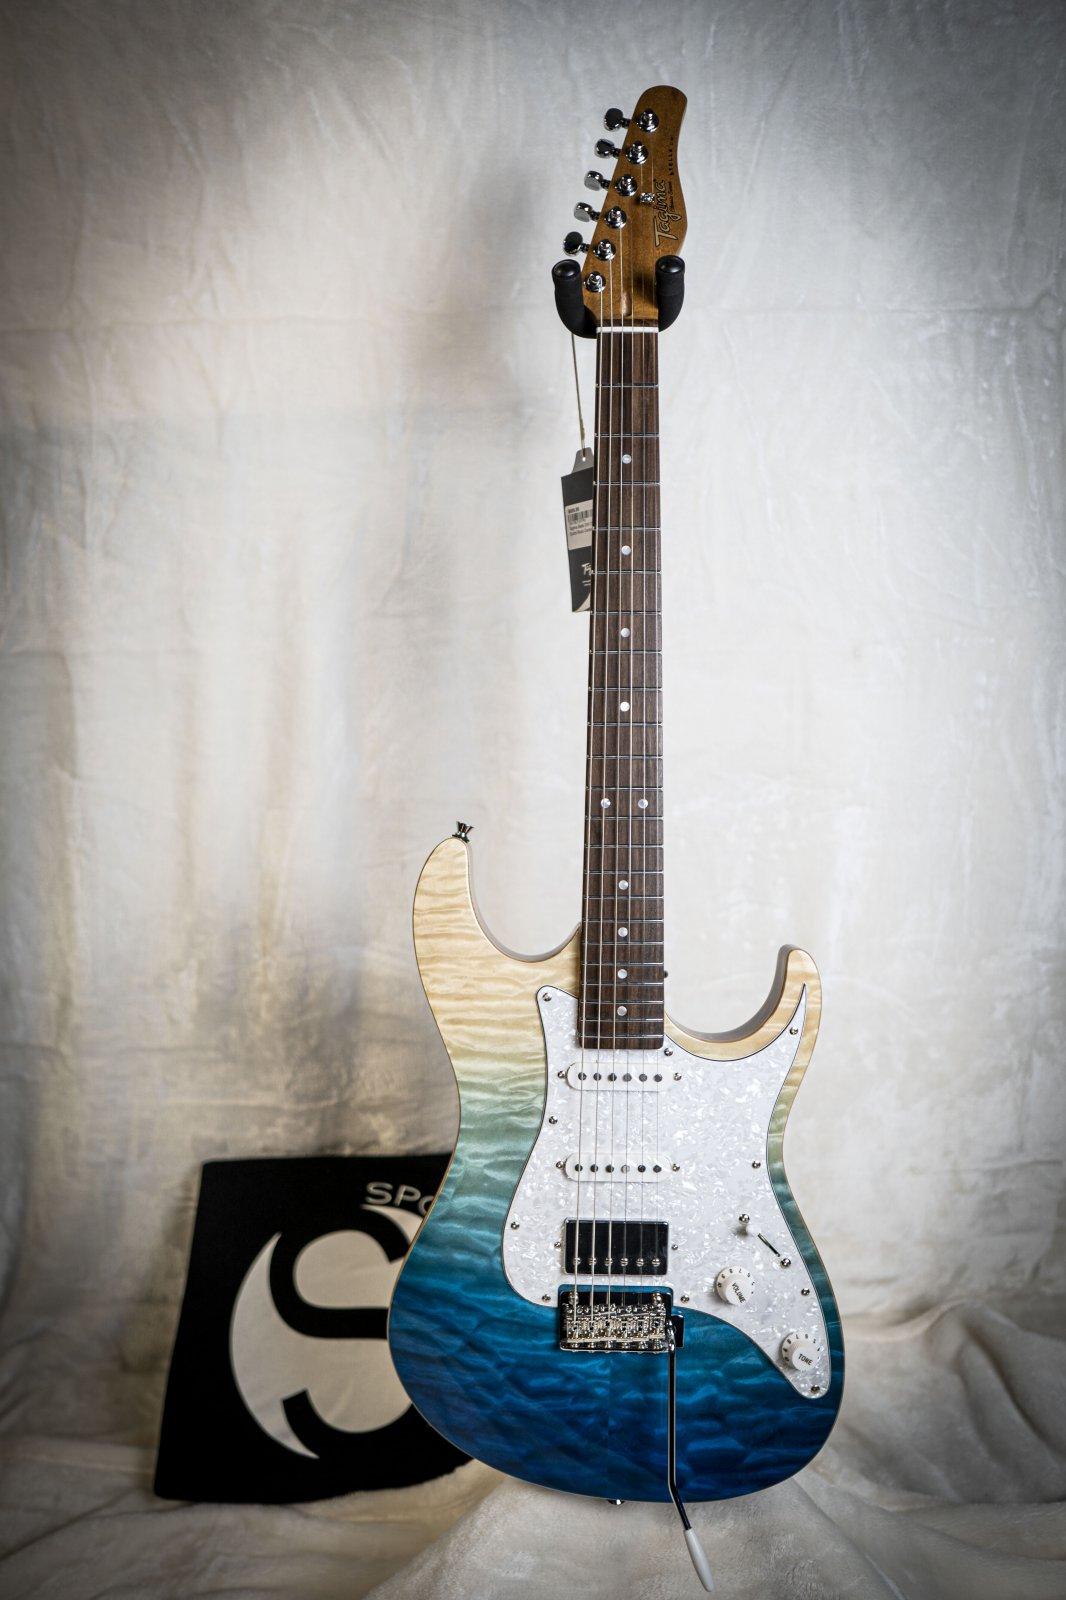 Tagima Stella DW-TBLF-DF/PW Blue Fade Electric Guitar